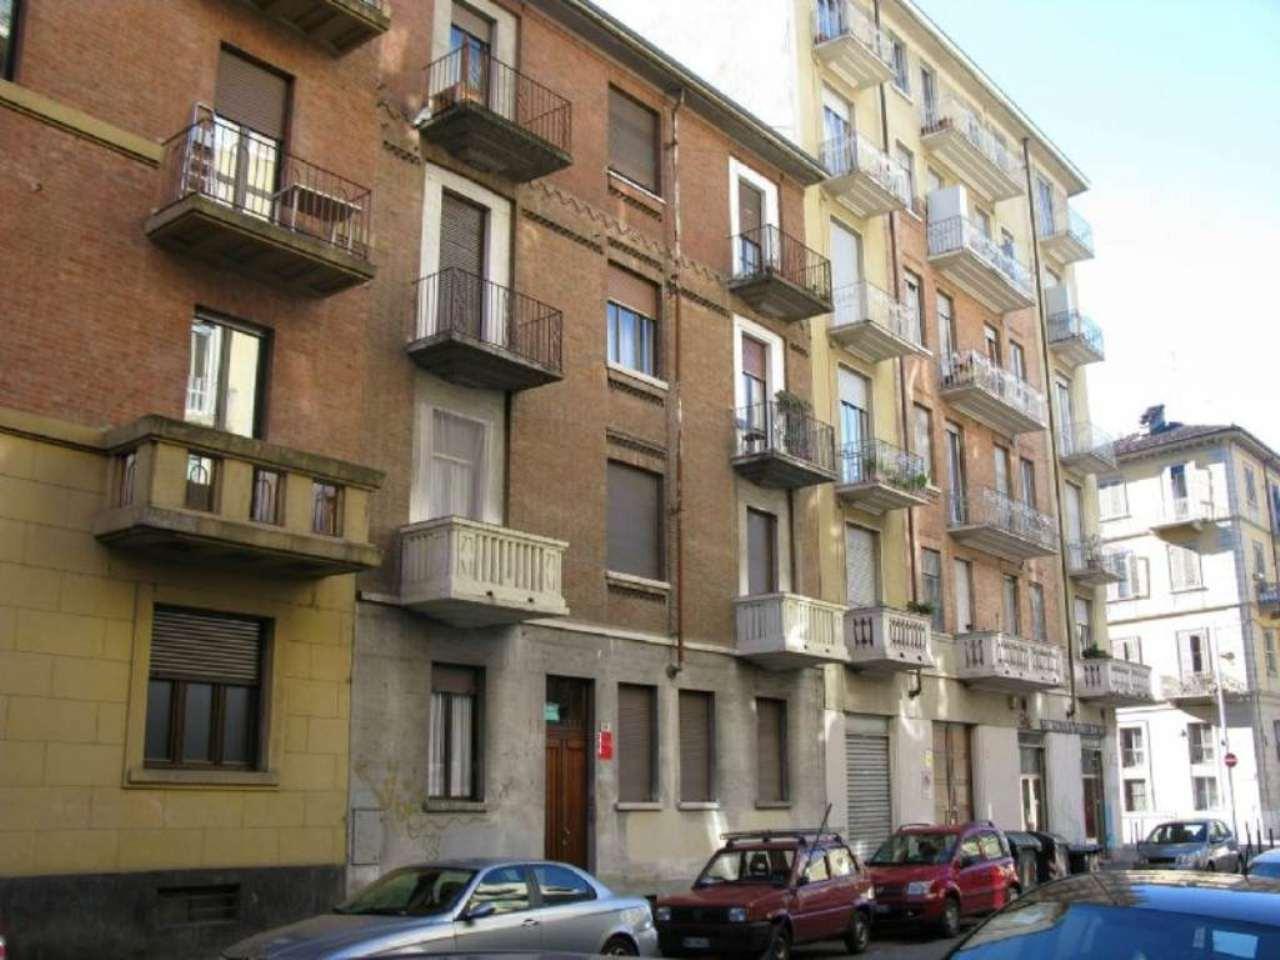 Bilocale Torino Via Porporati 1